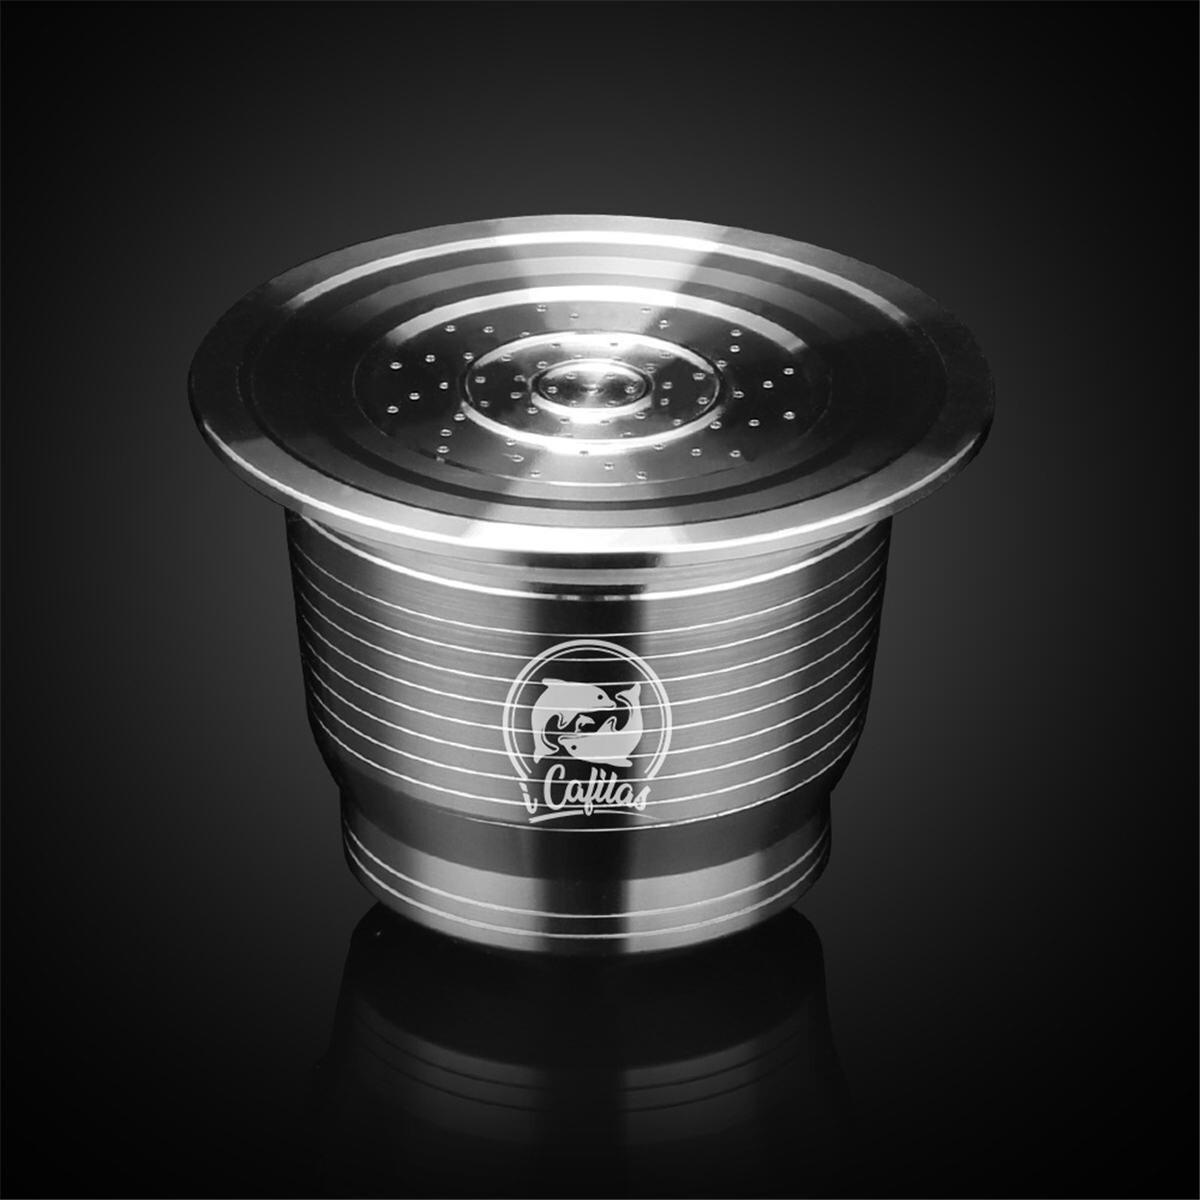 Filtros de café de acero inoxidable, taza Cápsula de café reutilizable, Kit rellenable para máquina Nespresso U